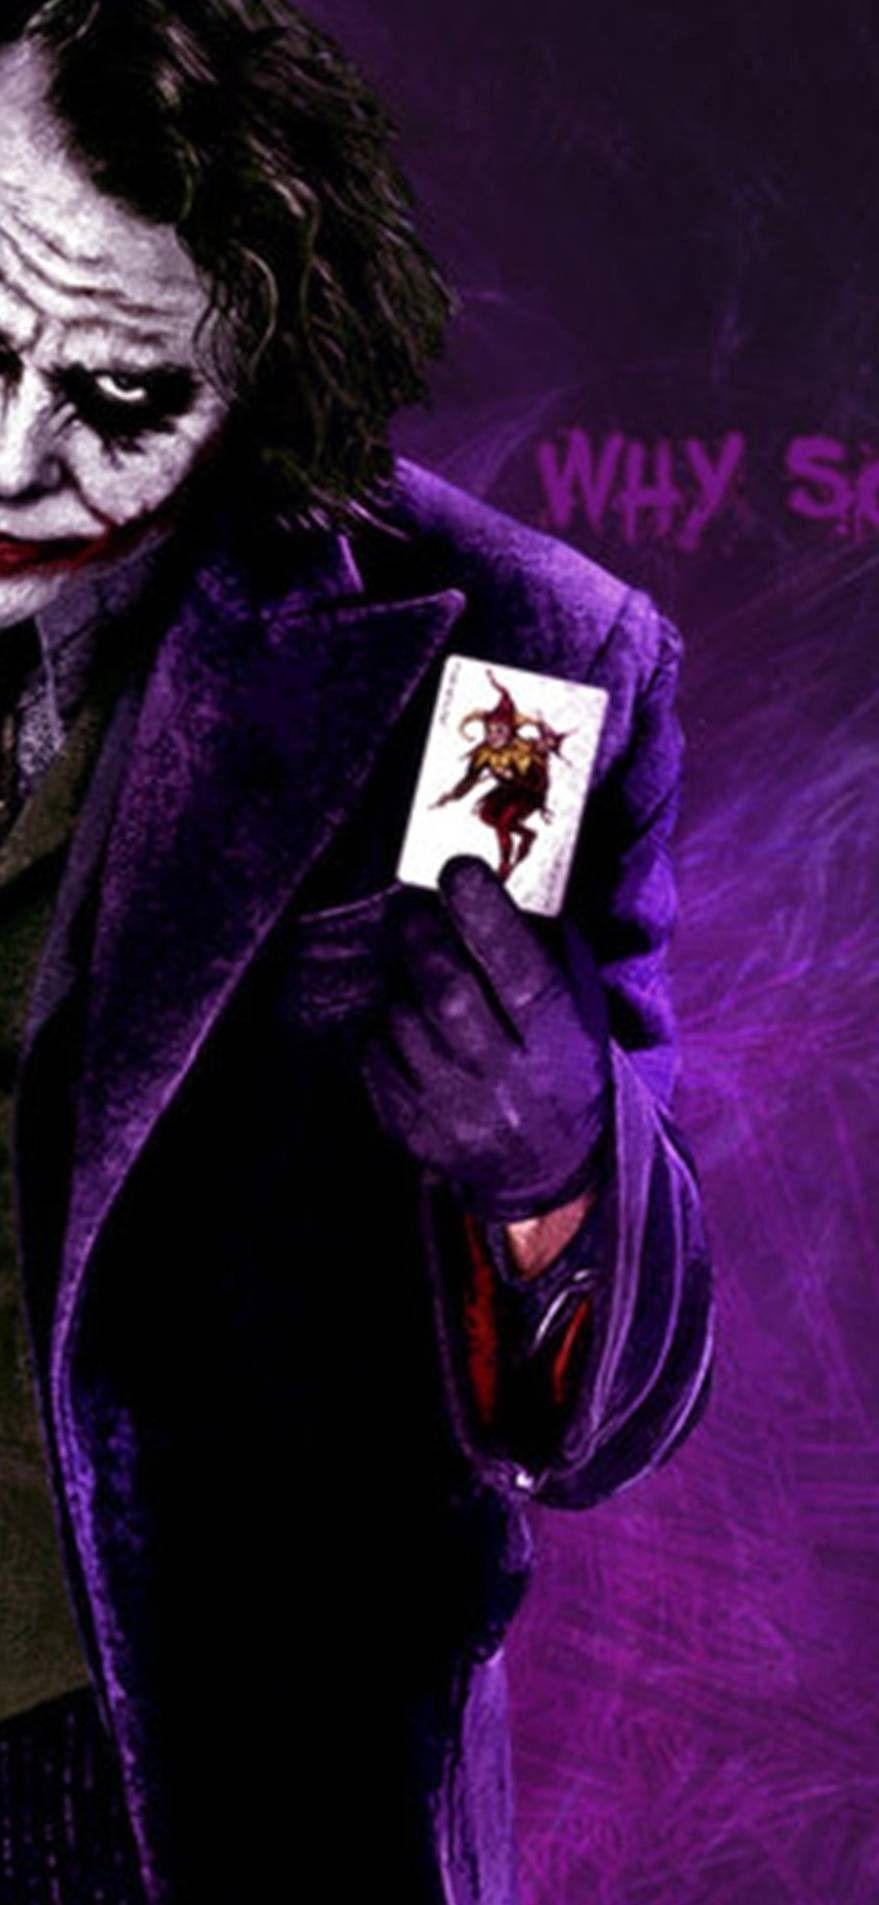 Joker why so serious iphone wallpaper hd